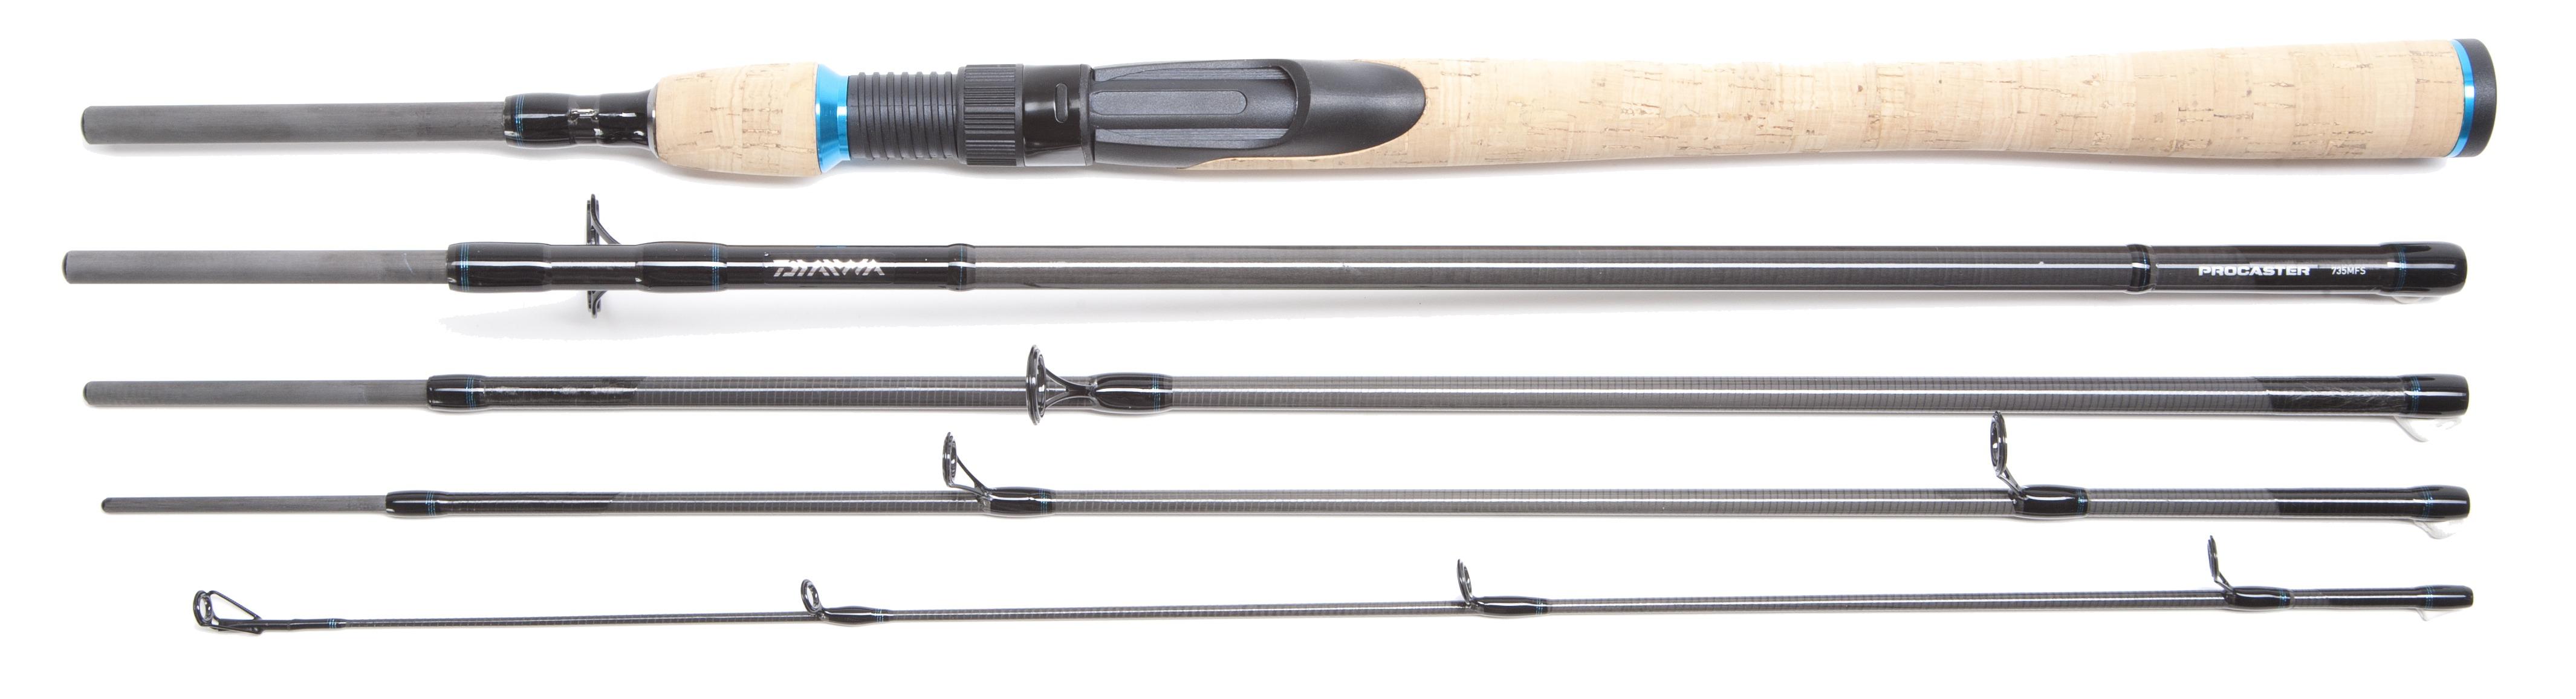 Daiwa procaster s travel spinning rod series glasgow for Daiwa fishing pole